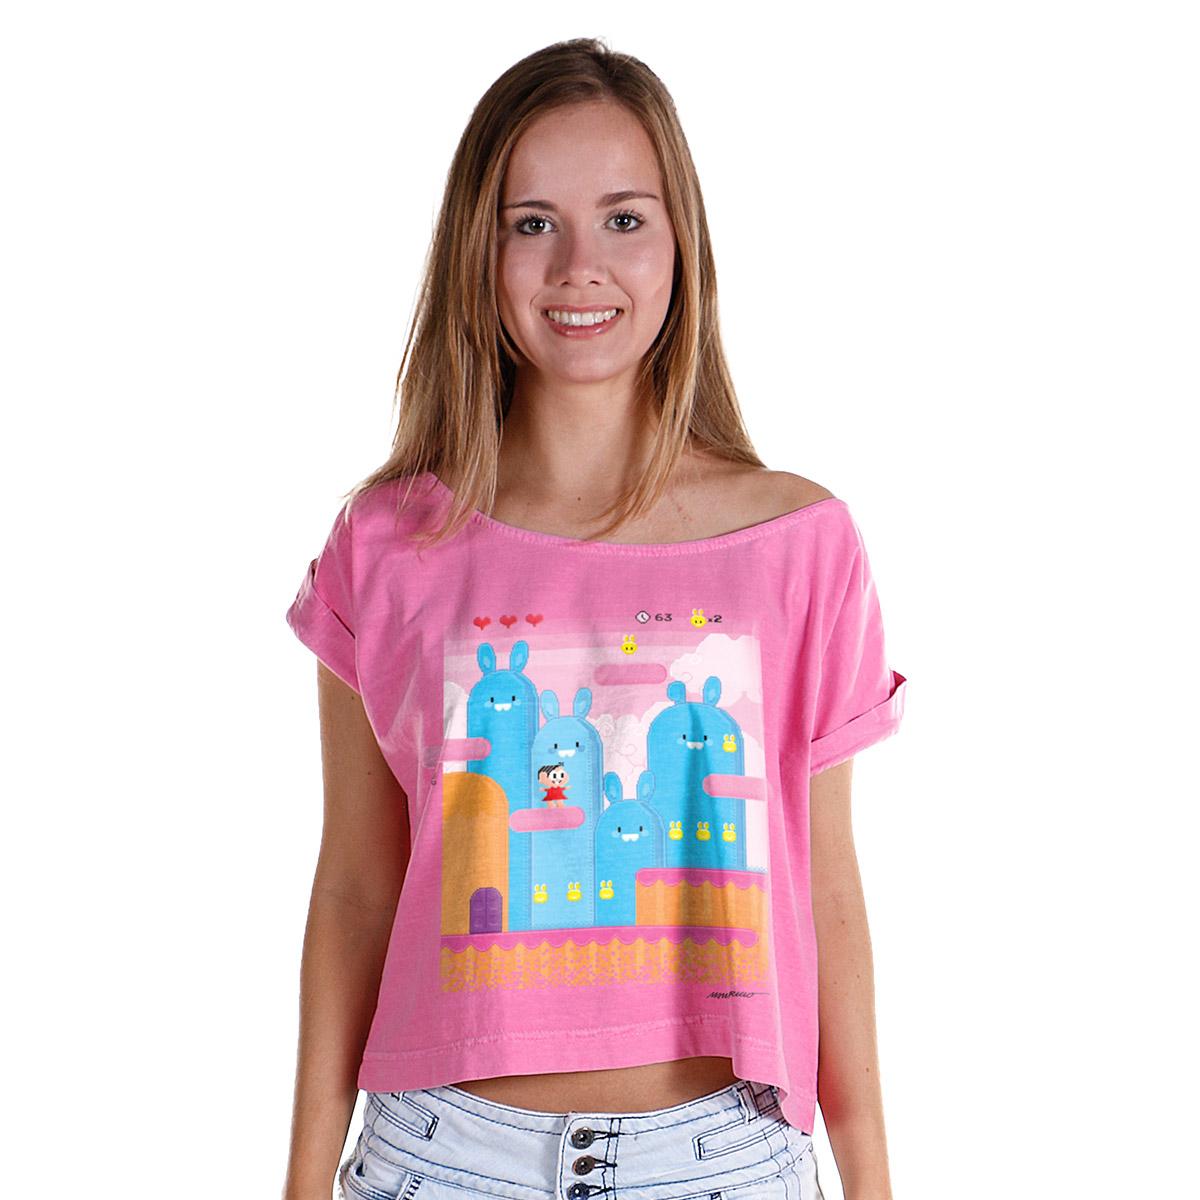 T-shirt Premium Feminina Turma da Mônica Pixel Mônica